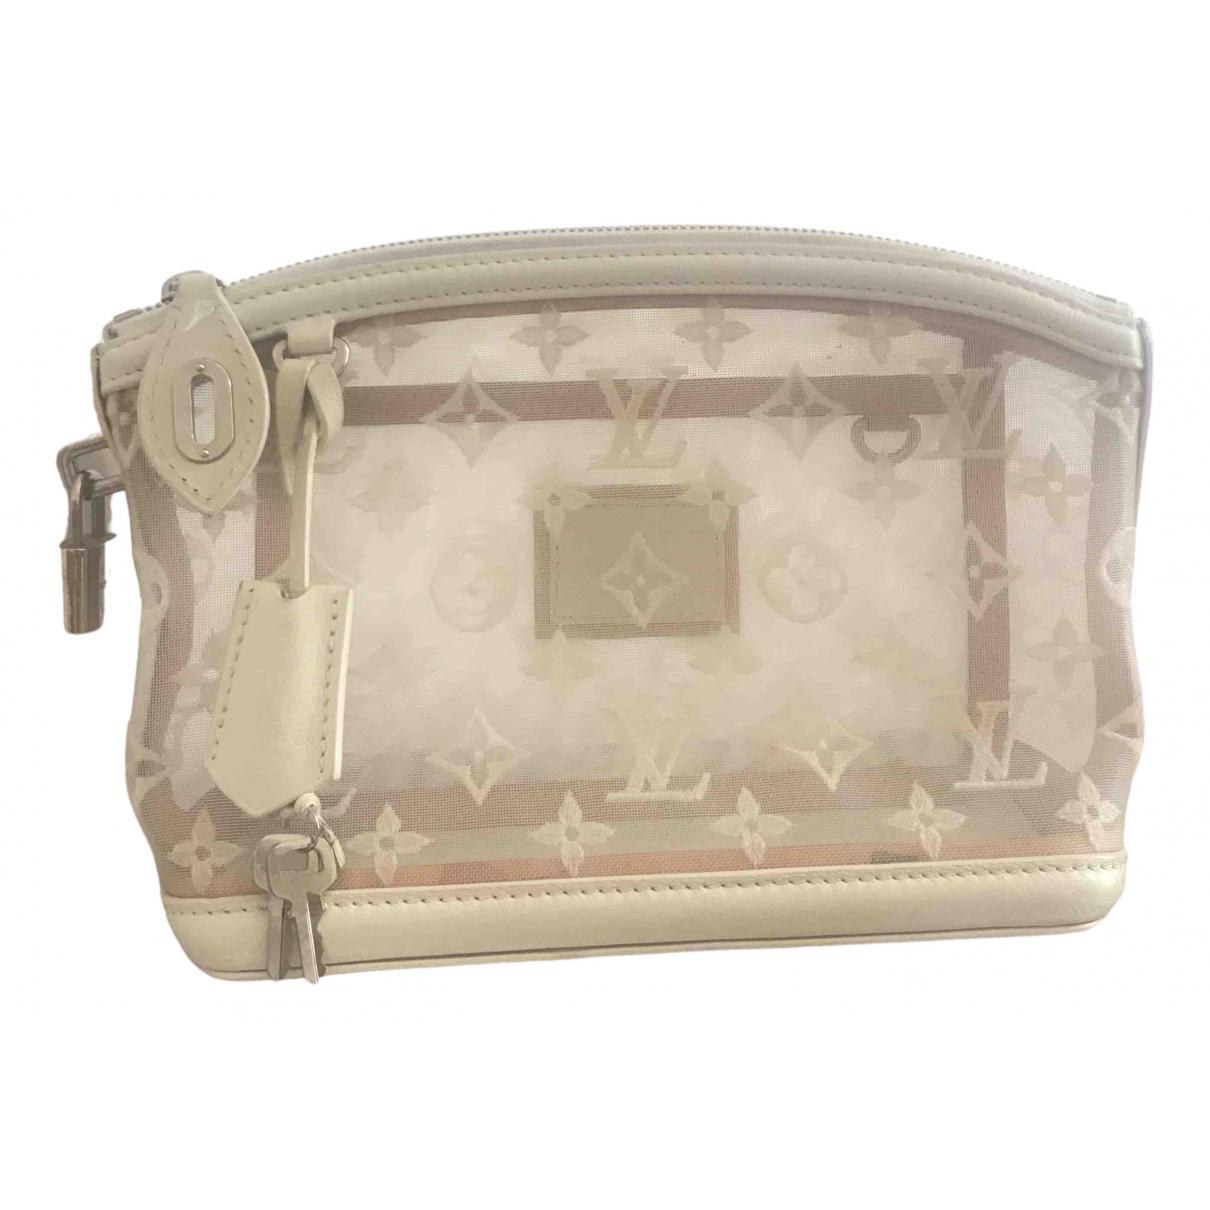 Pochette Lockit de Cuero Louis Vuitton